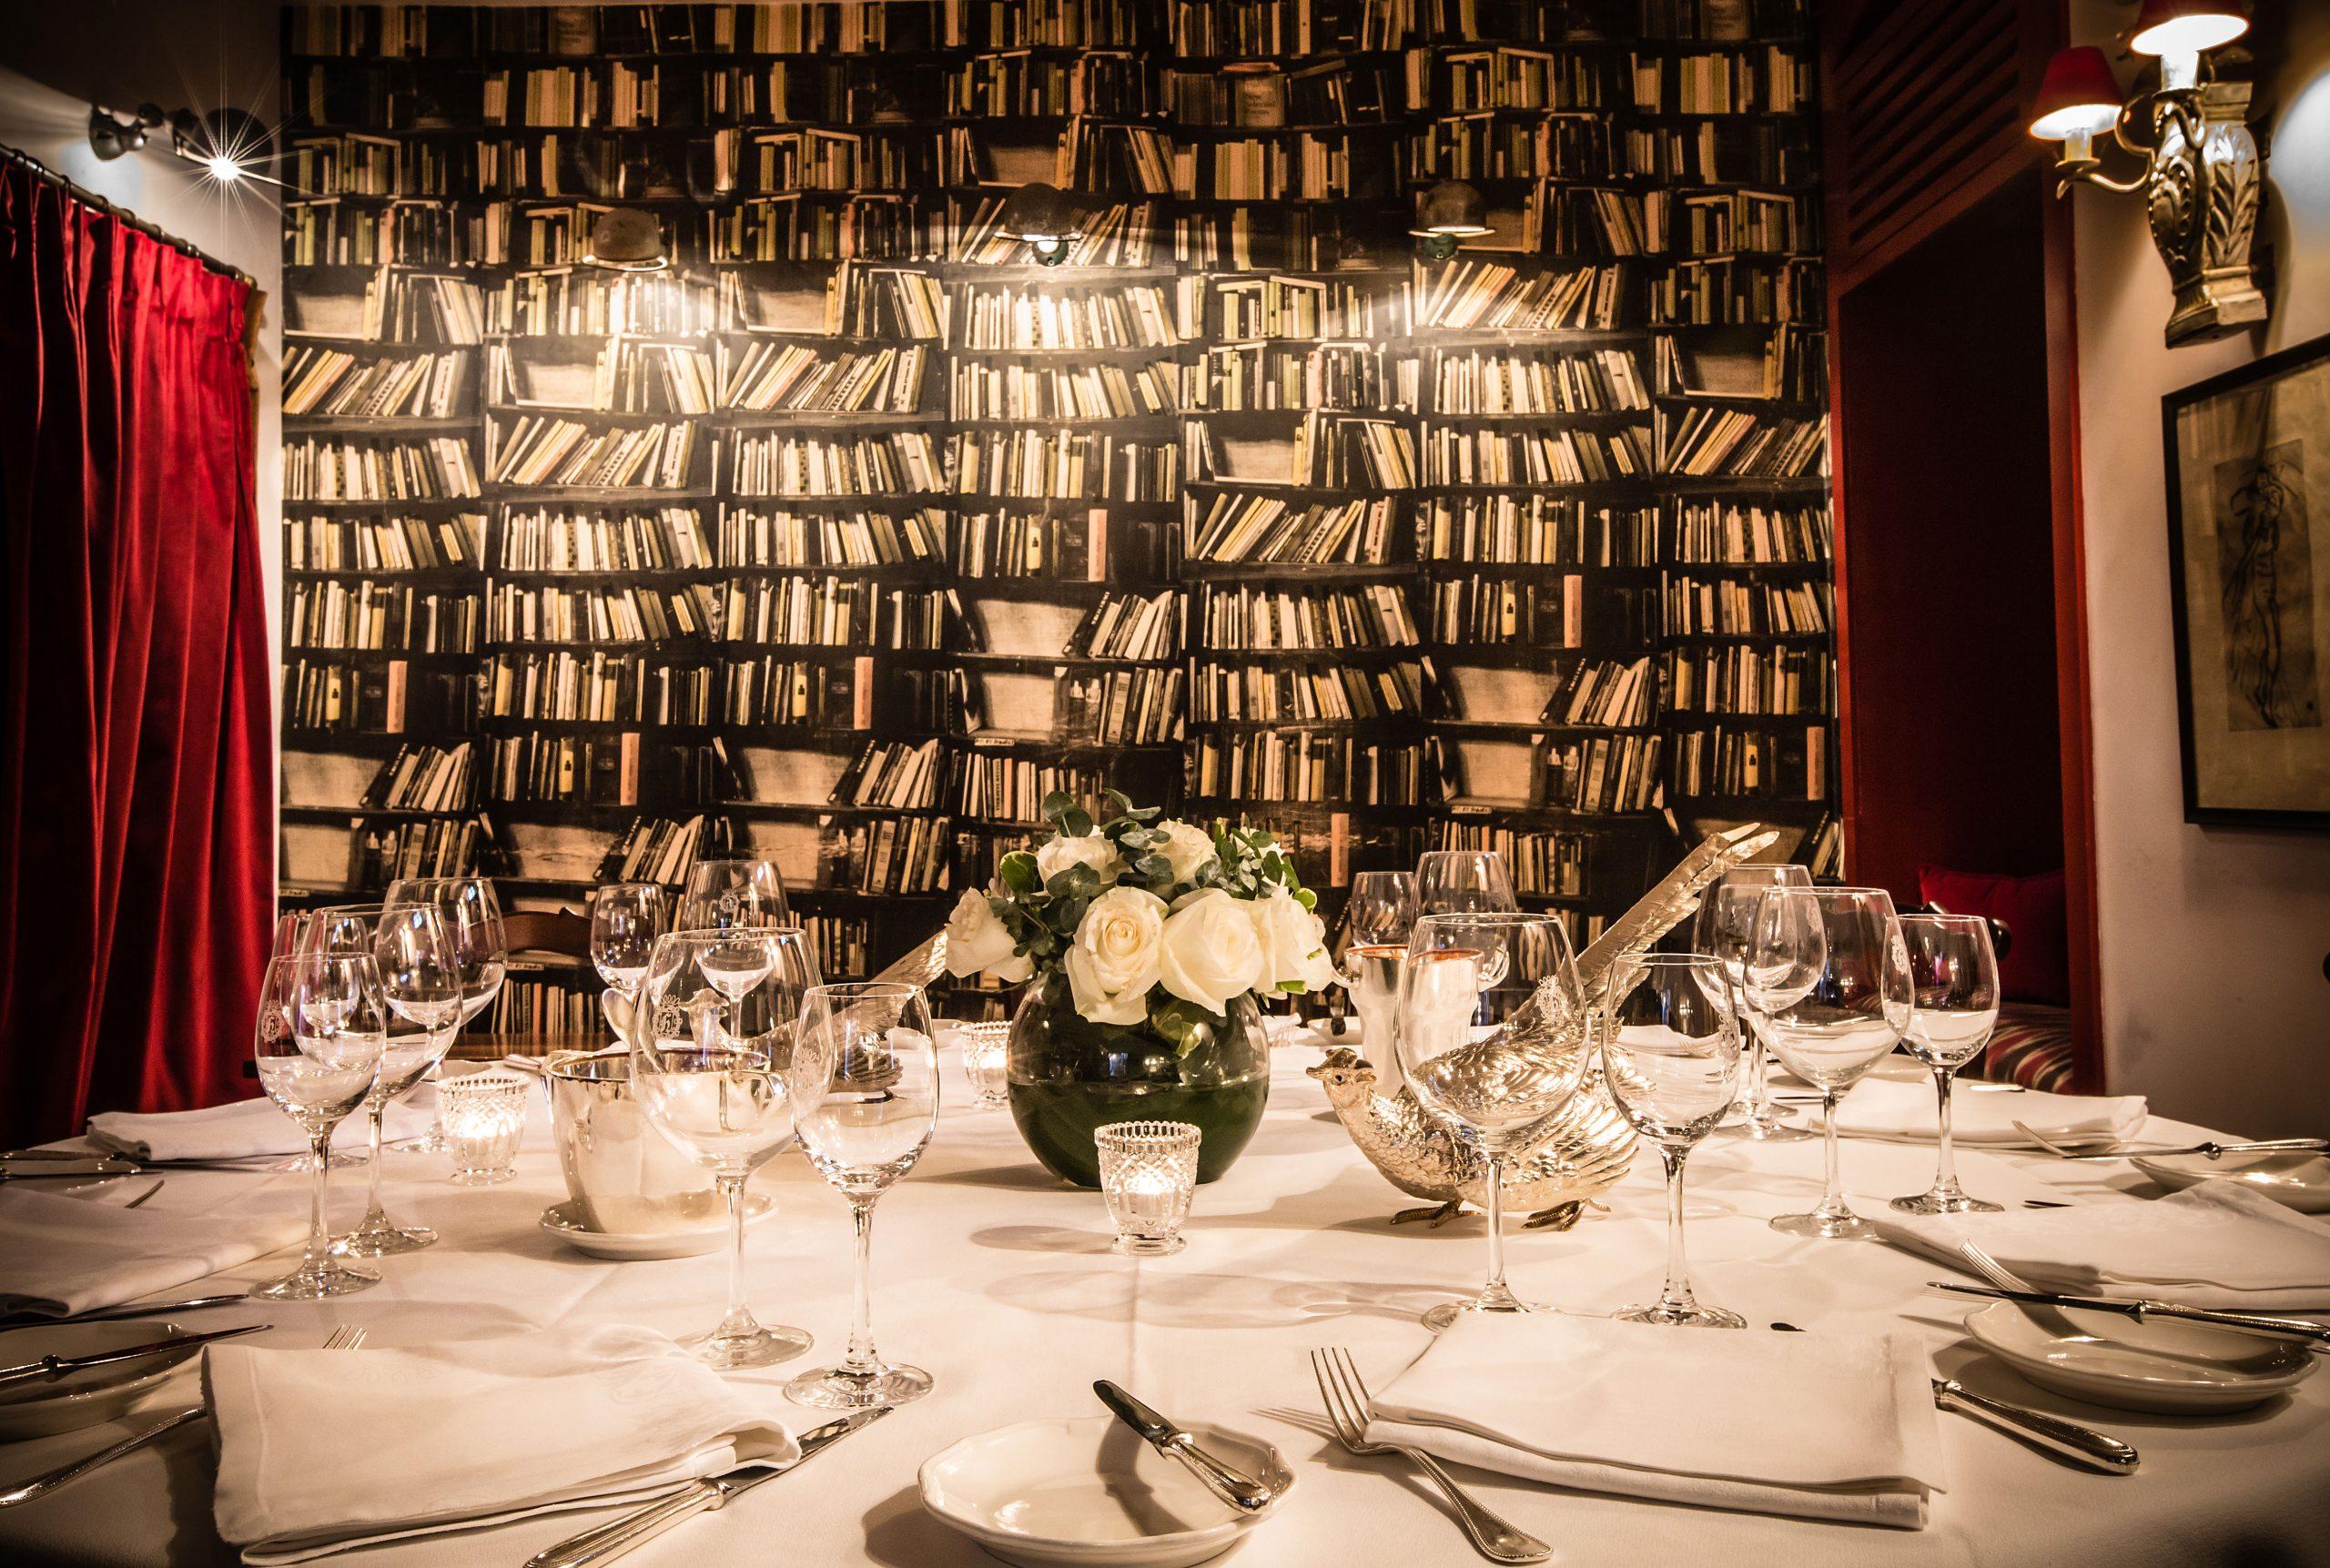 Reservado restaurante Horcher, Madrid